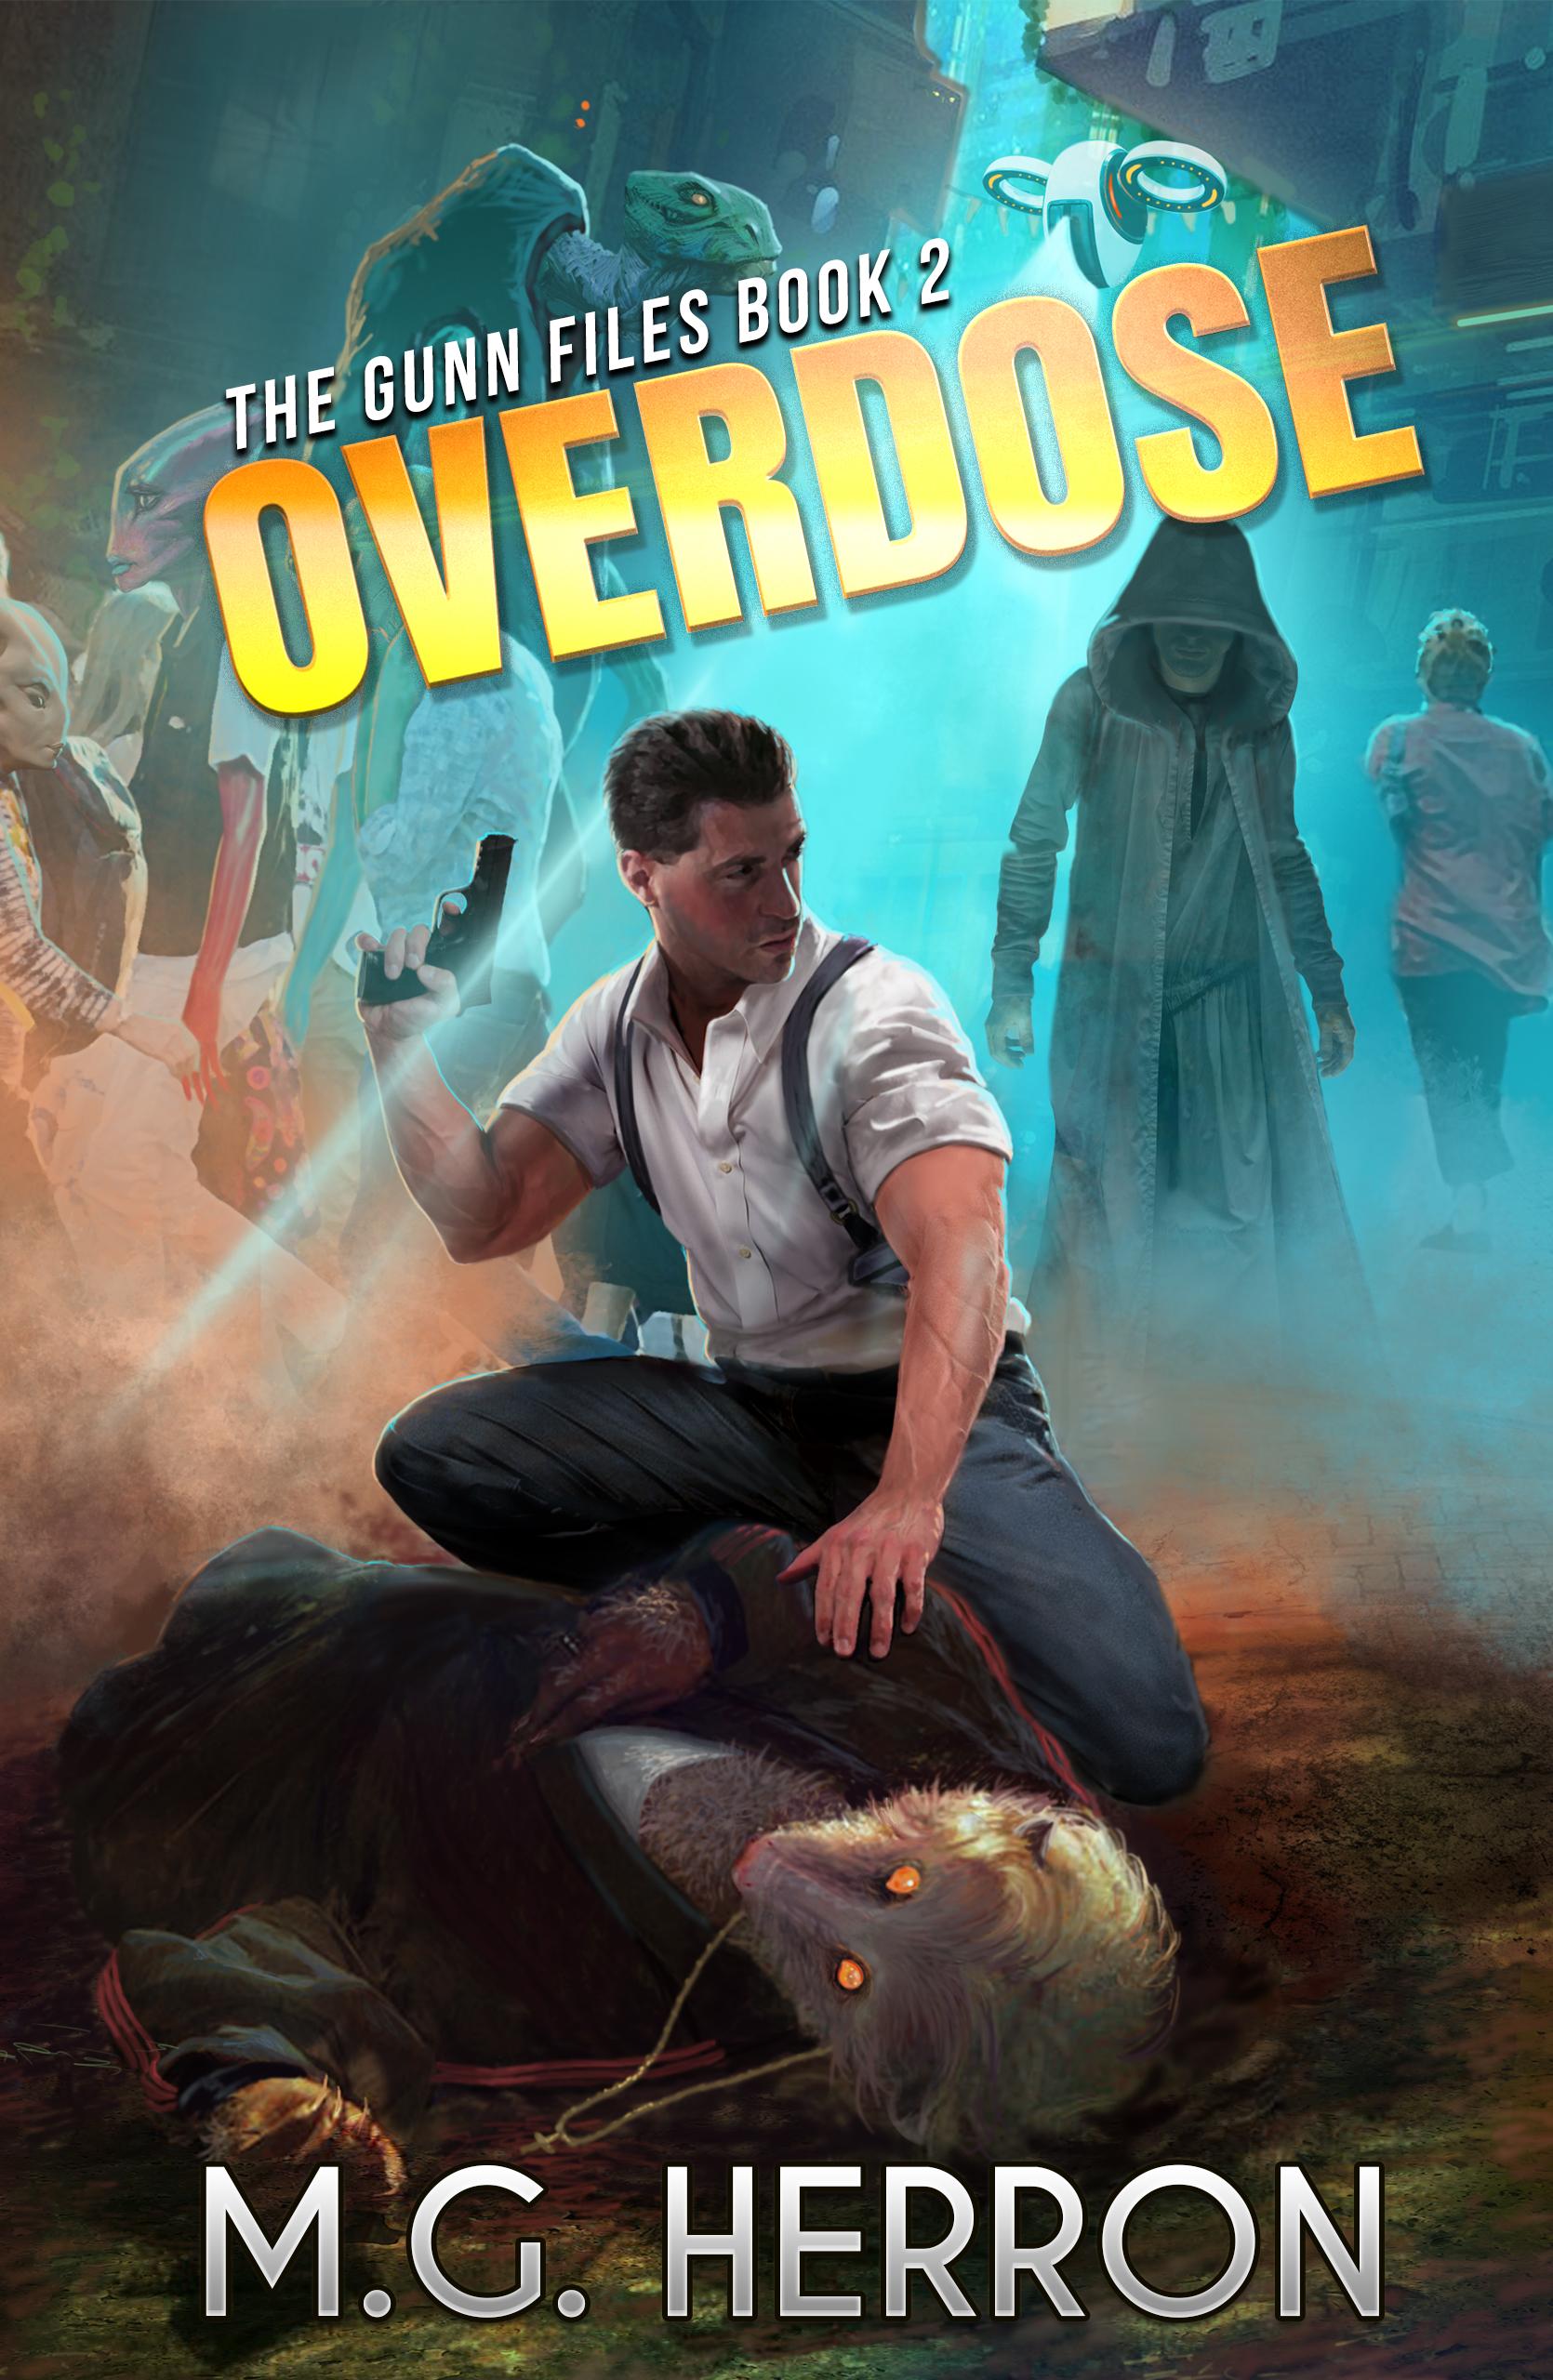 Overdoes   The Gunn Files Book 2  M.G. Herron